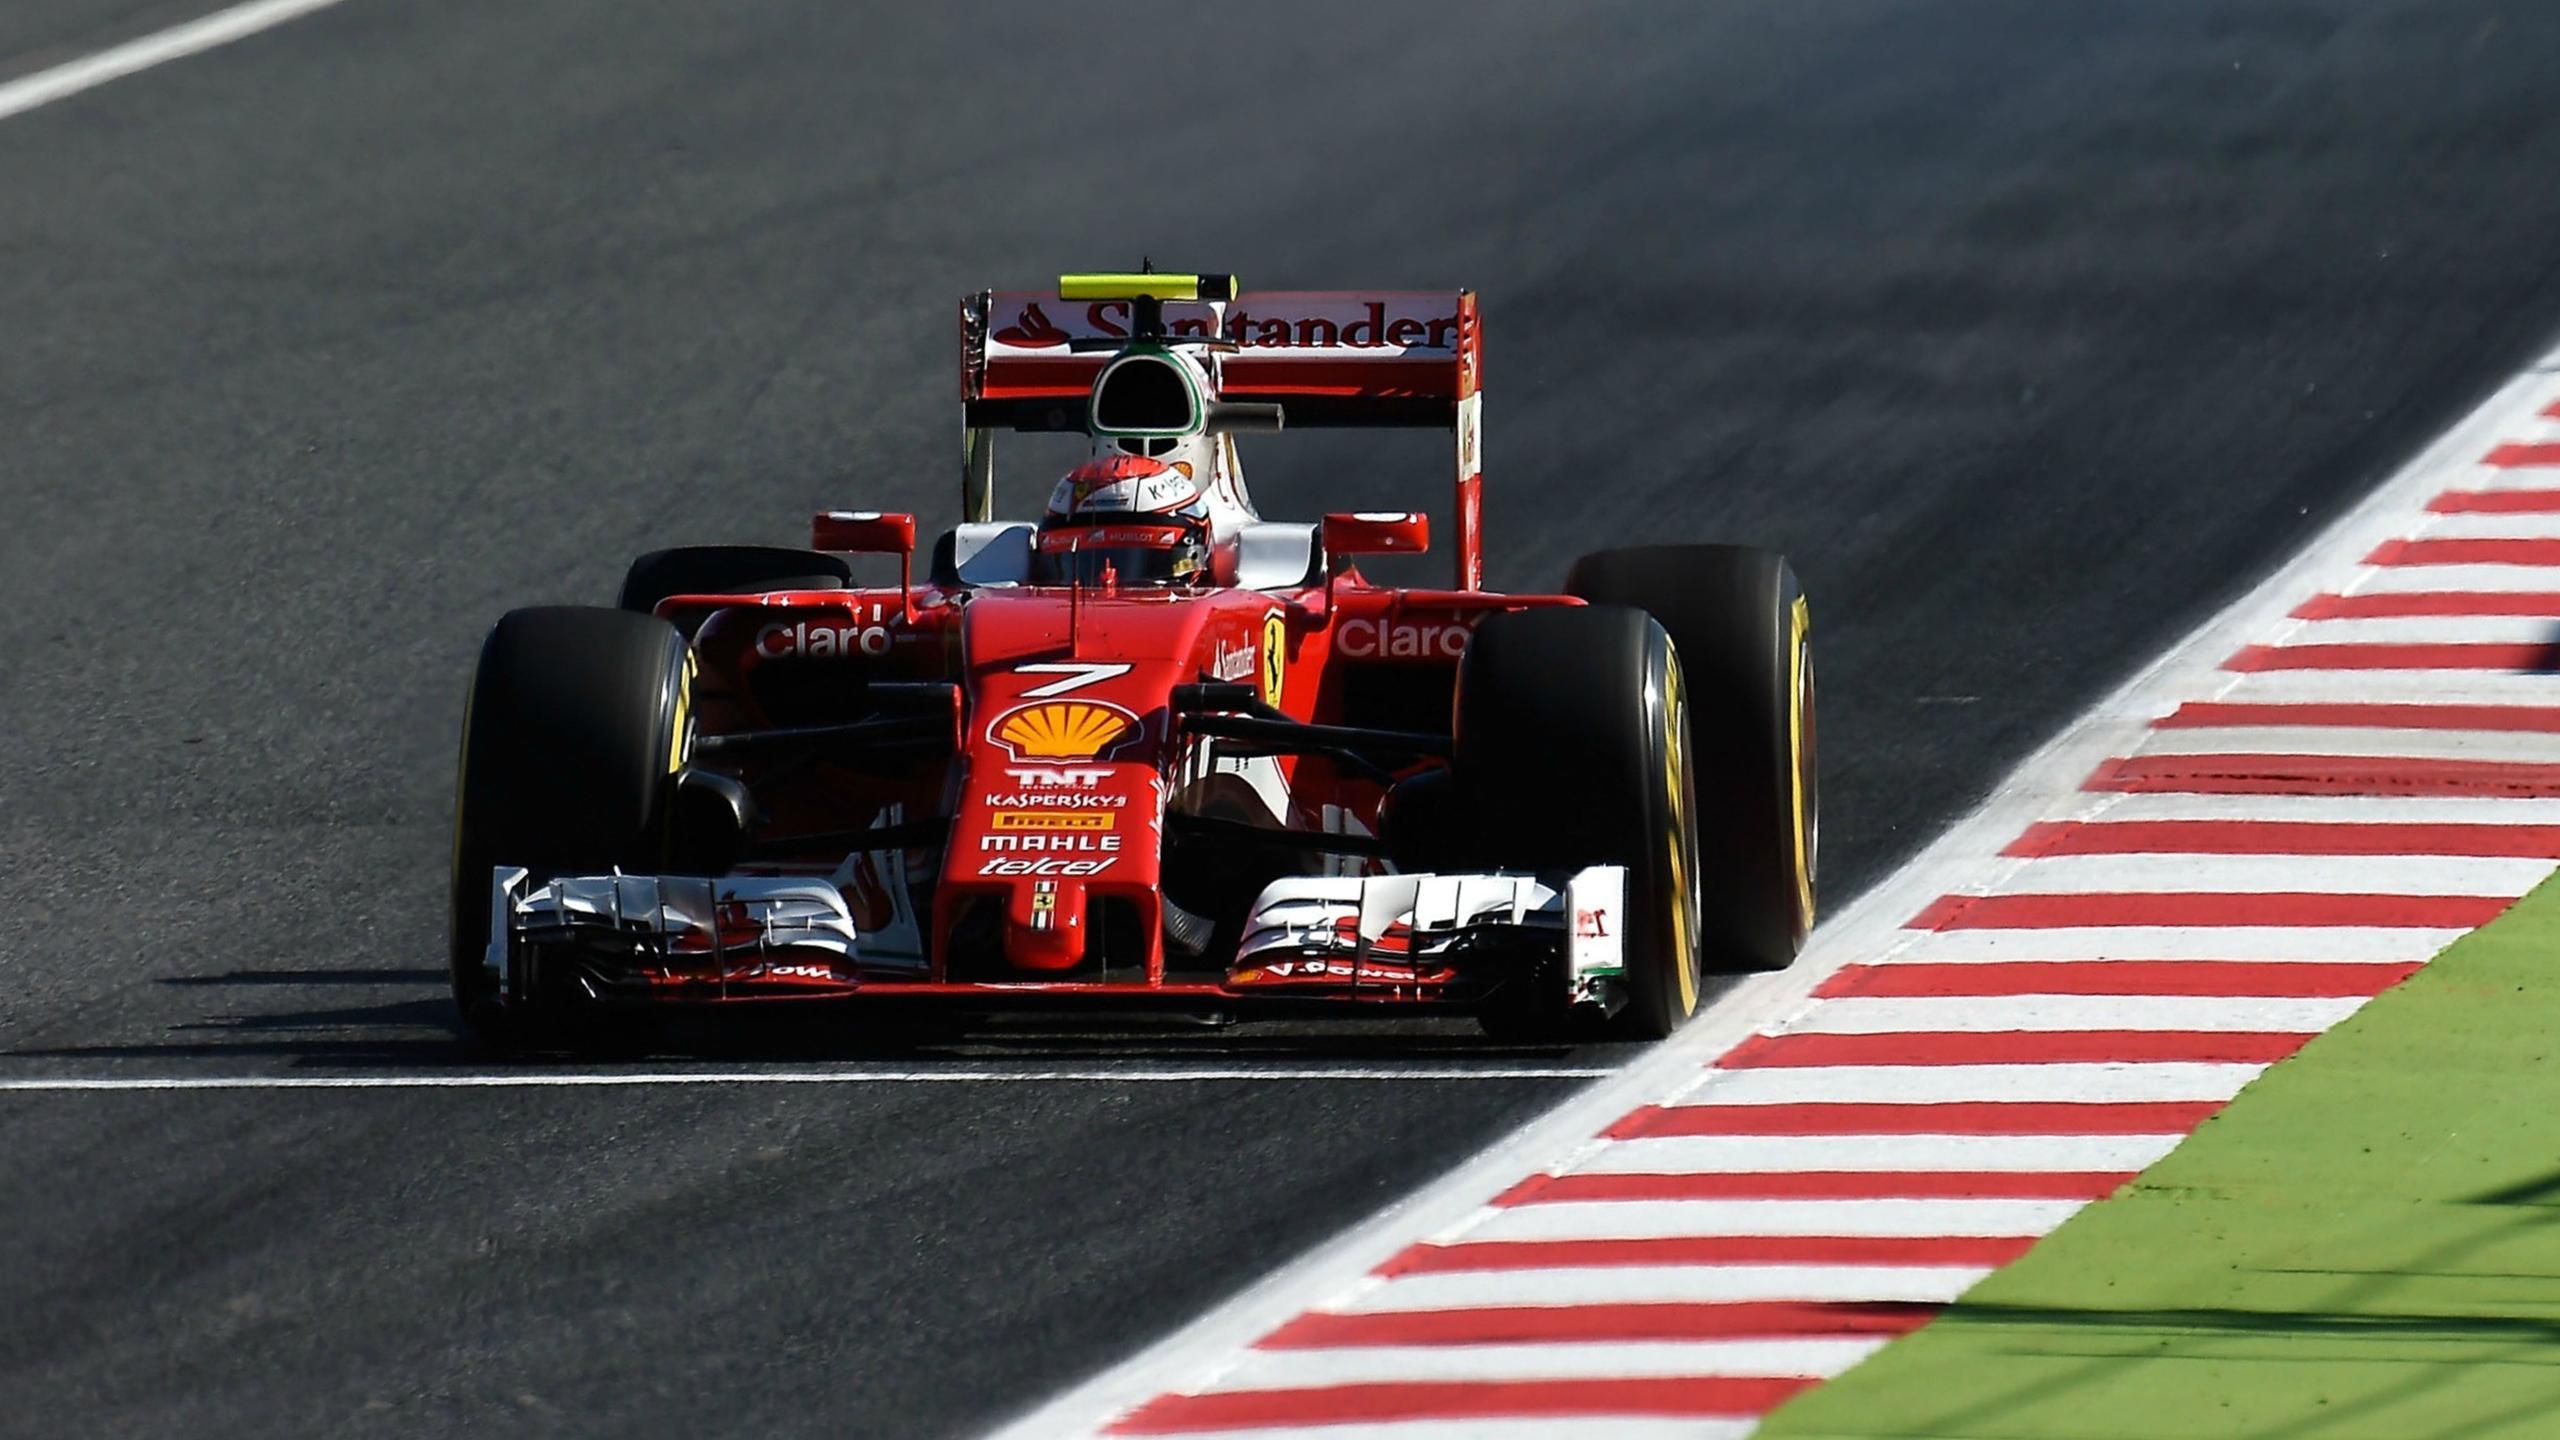 Kimi Räikkönen (Ferrari) au Grand Prix d'Espagne 2016